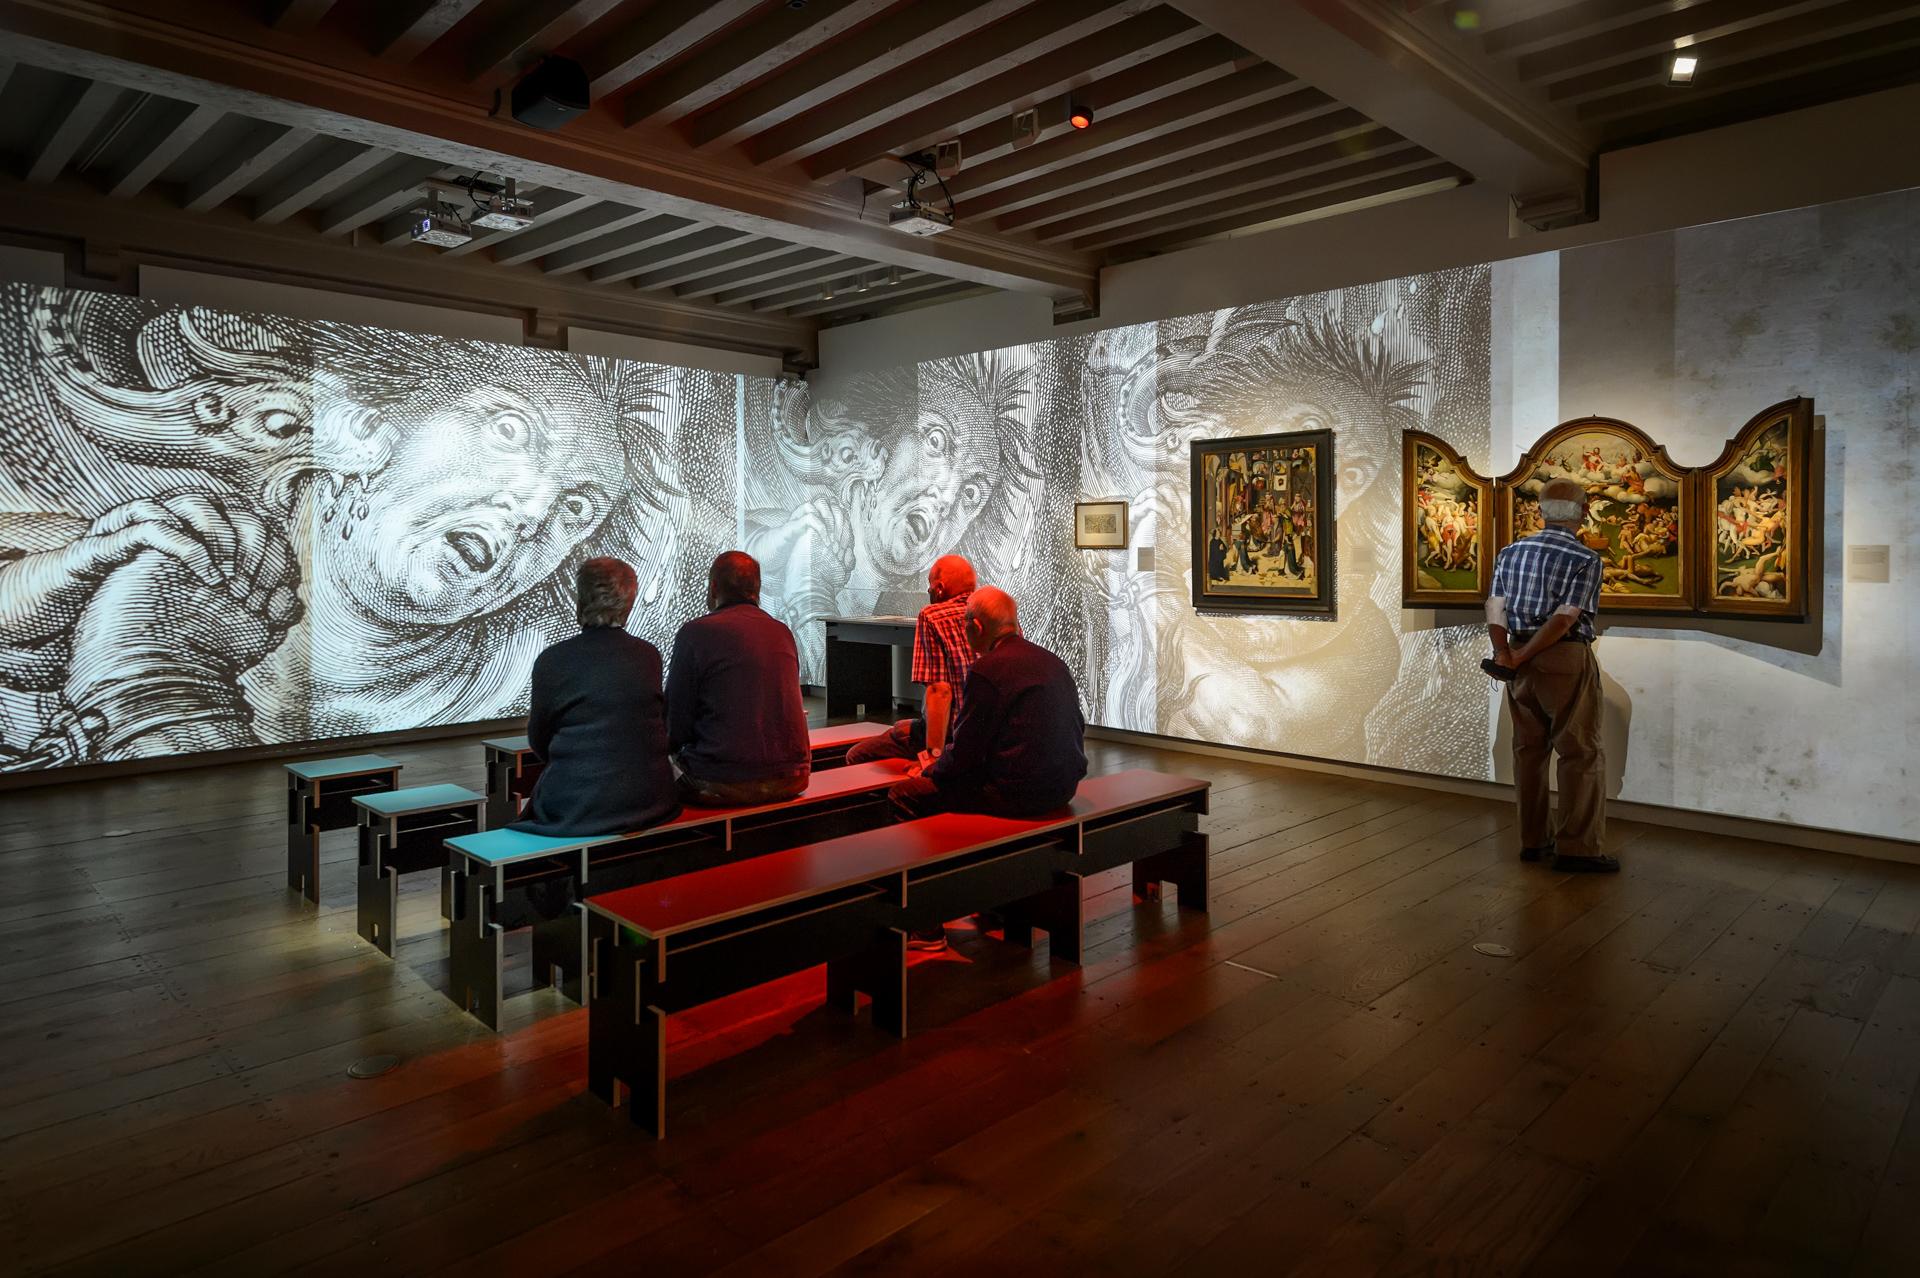 tentoonstellingsontwerp luther museum catherijneconvent 2 jpg